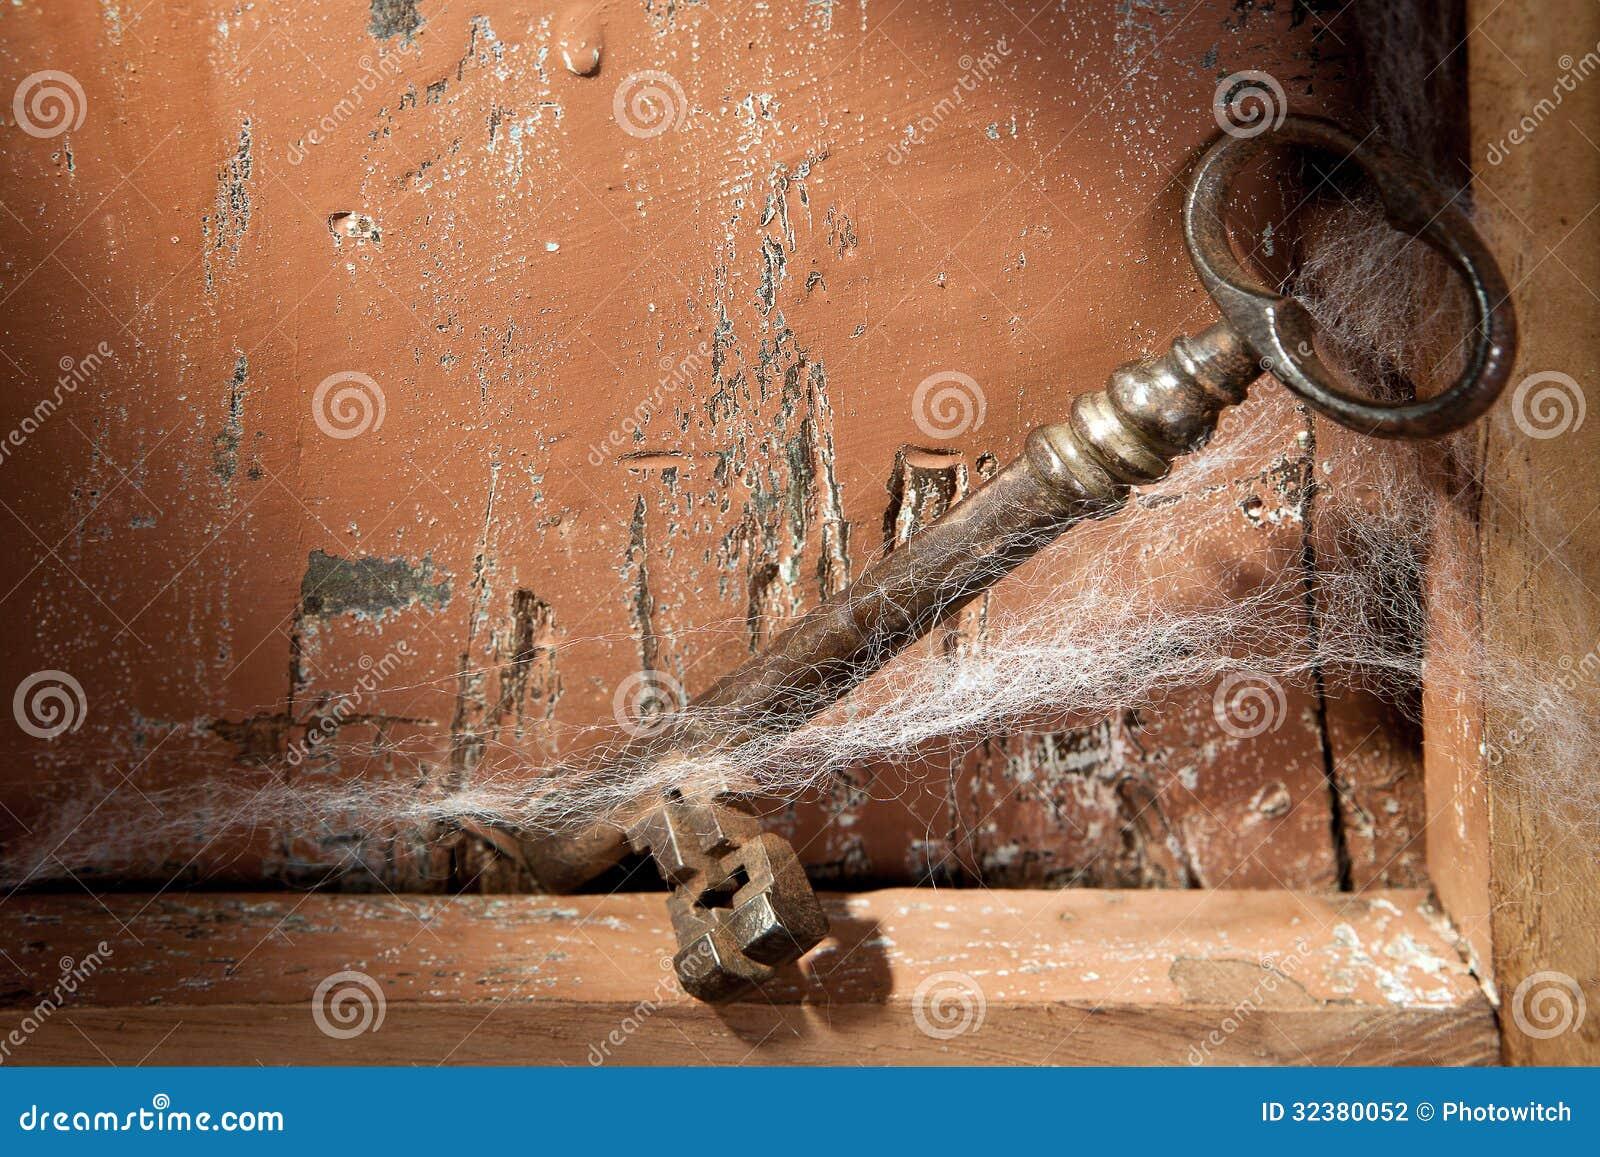 Old Key And Cobwebs Stock Photography Image 32380052